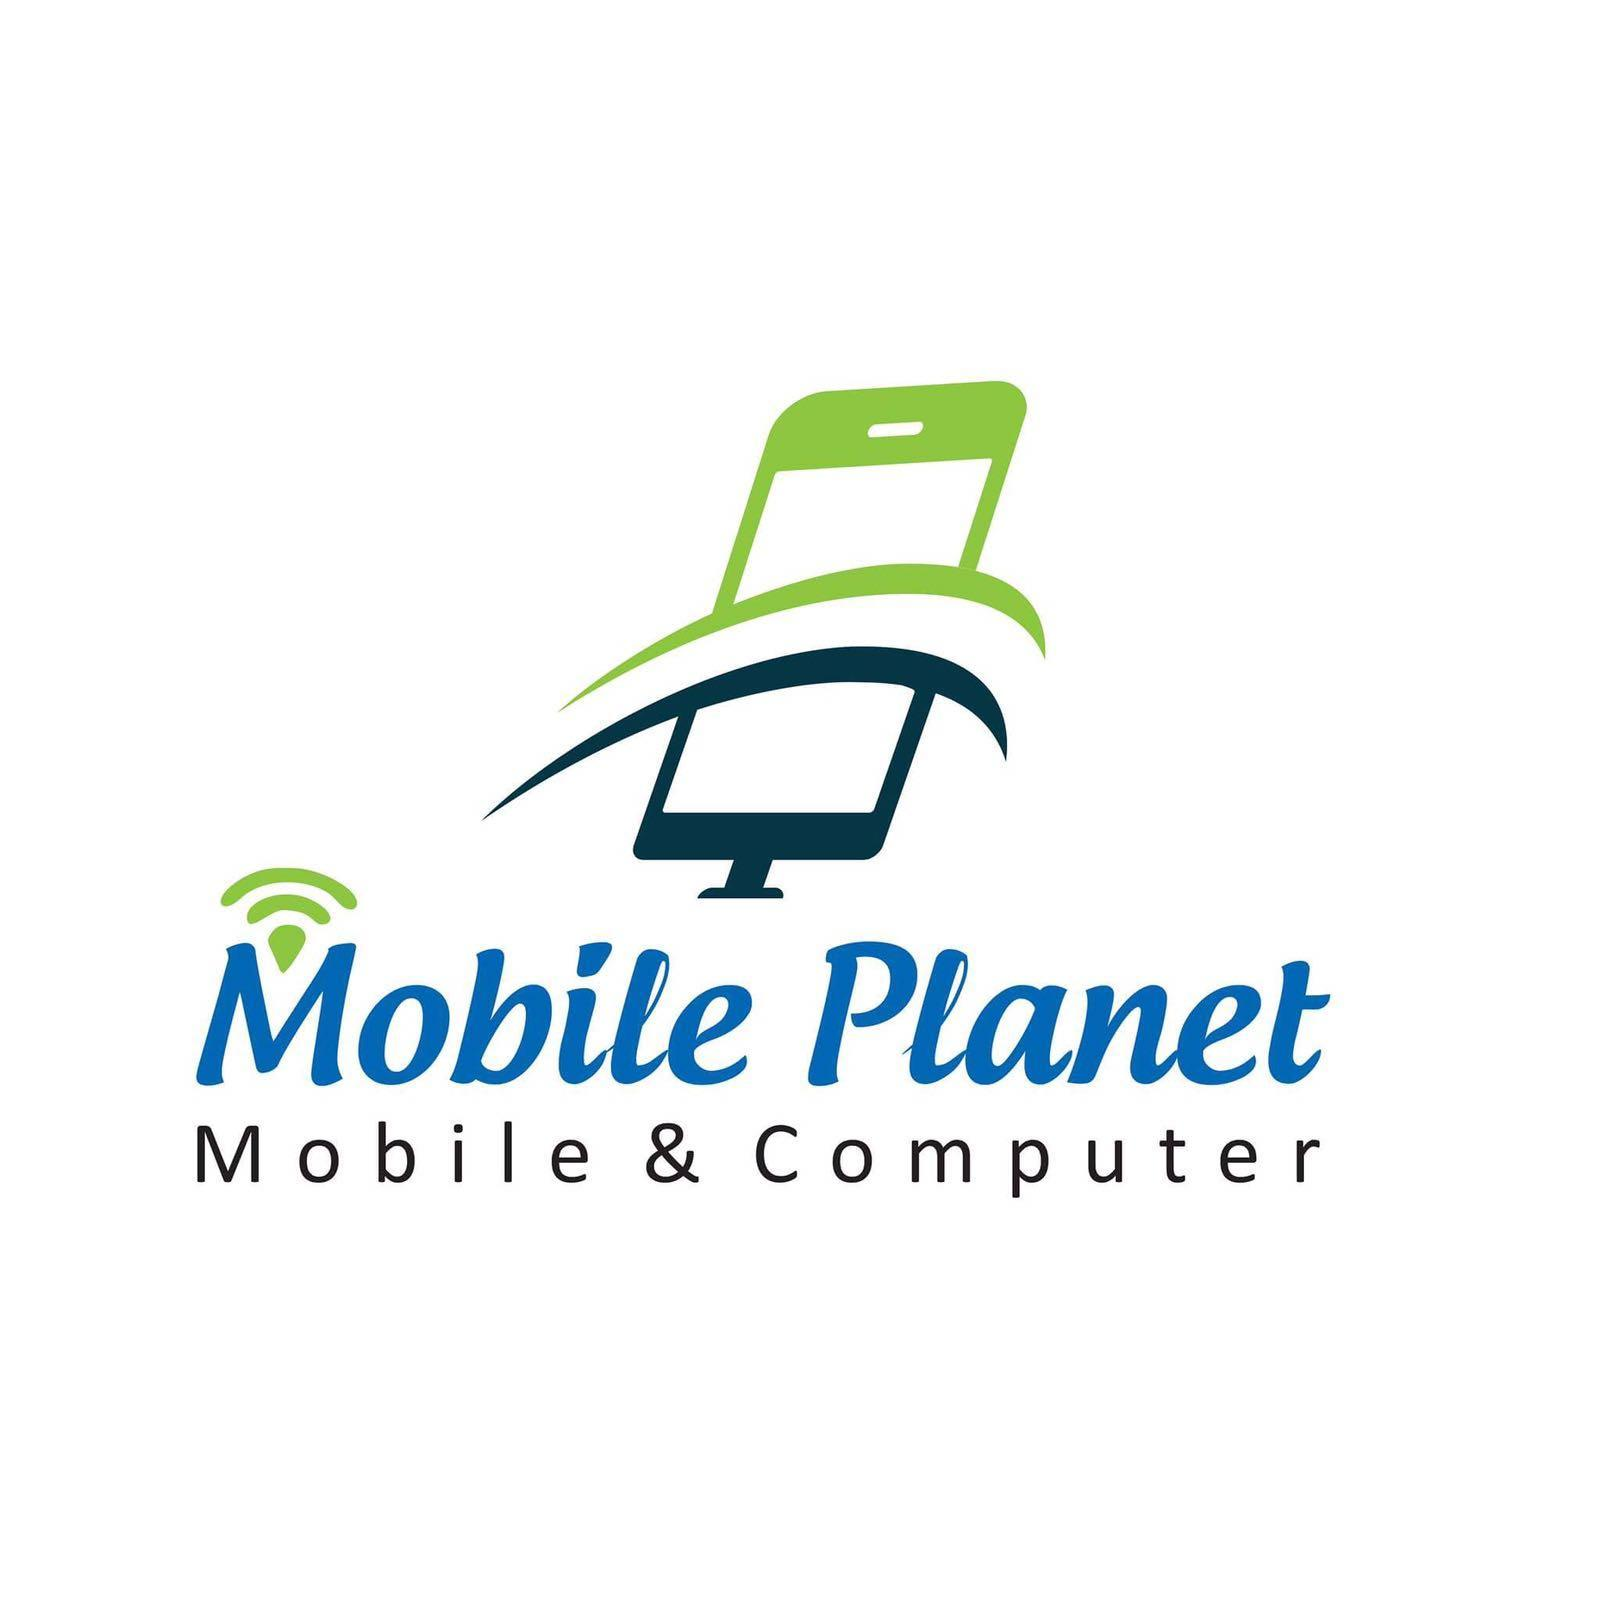 Mobile Planet MP - Harrow, London HA1 2UA - 07574 348294 | ShowMeLocal.com